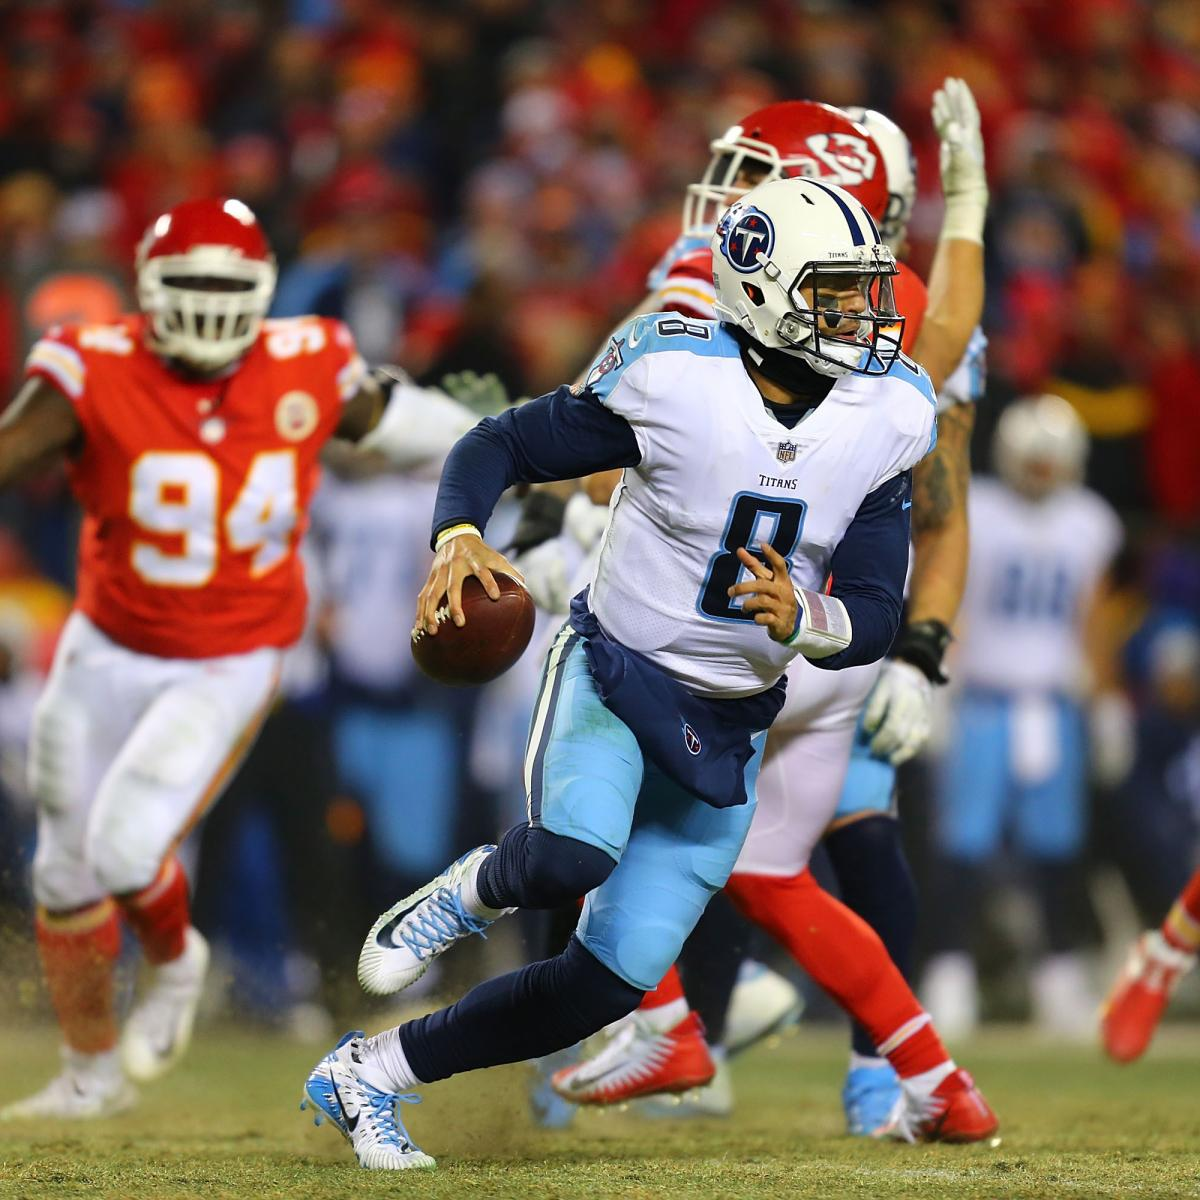 NFL Playoffs 2018: Dates, Matchups And Bracket Breakdown